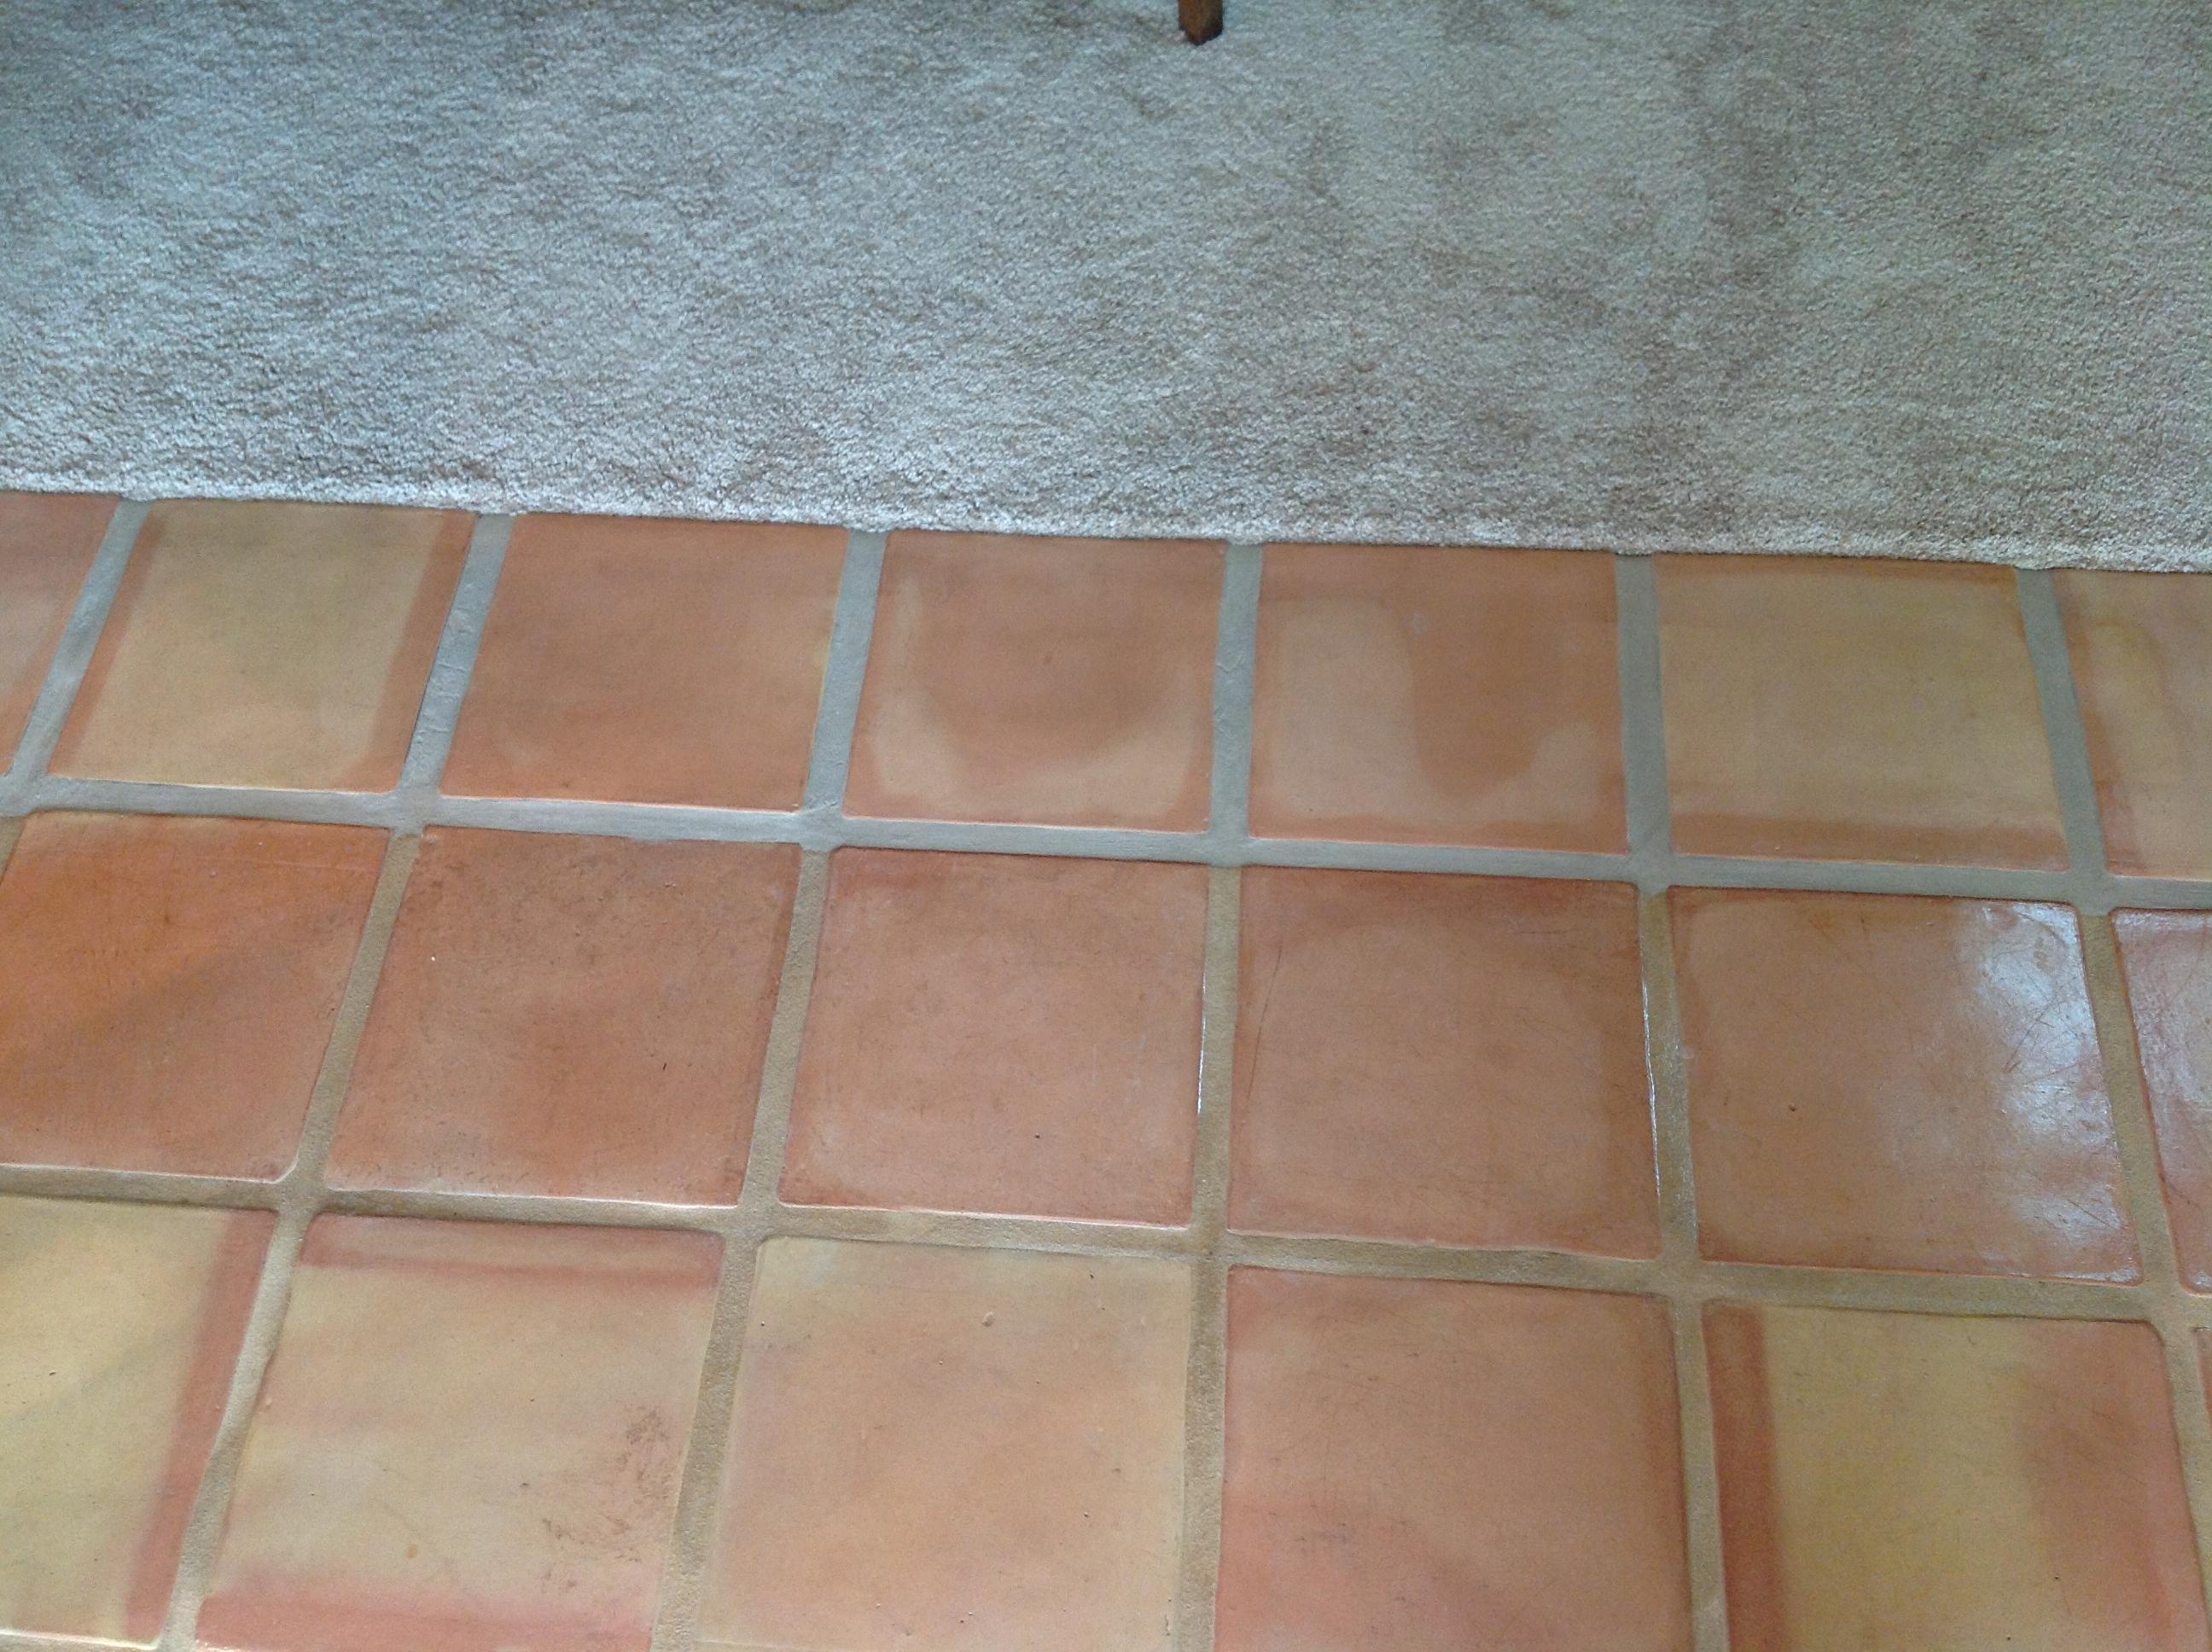 saltillo tile dirty peeling dull